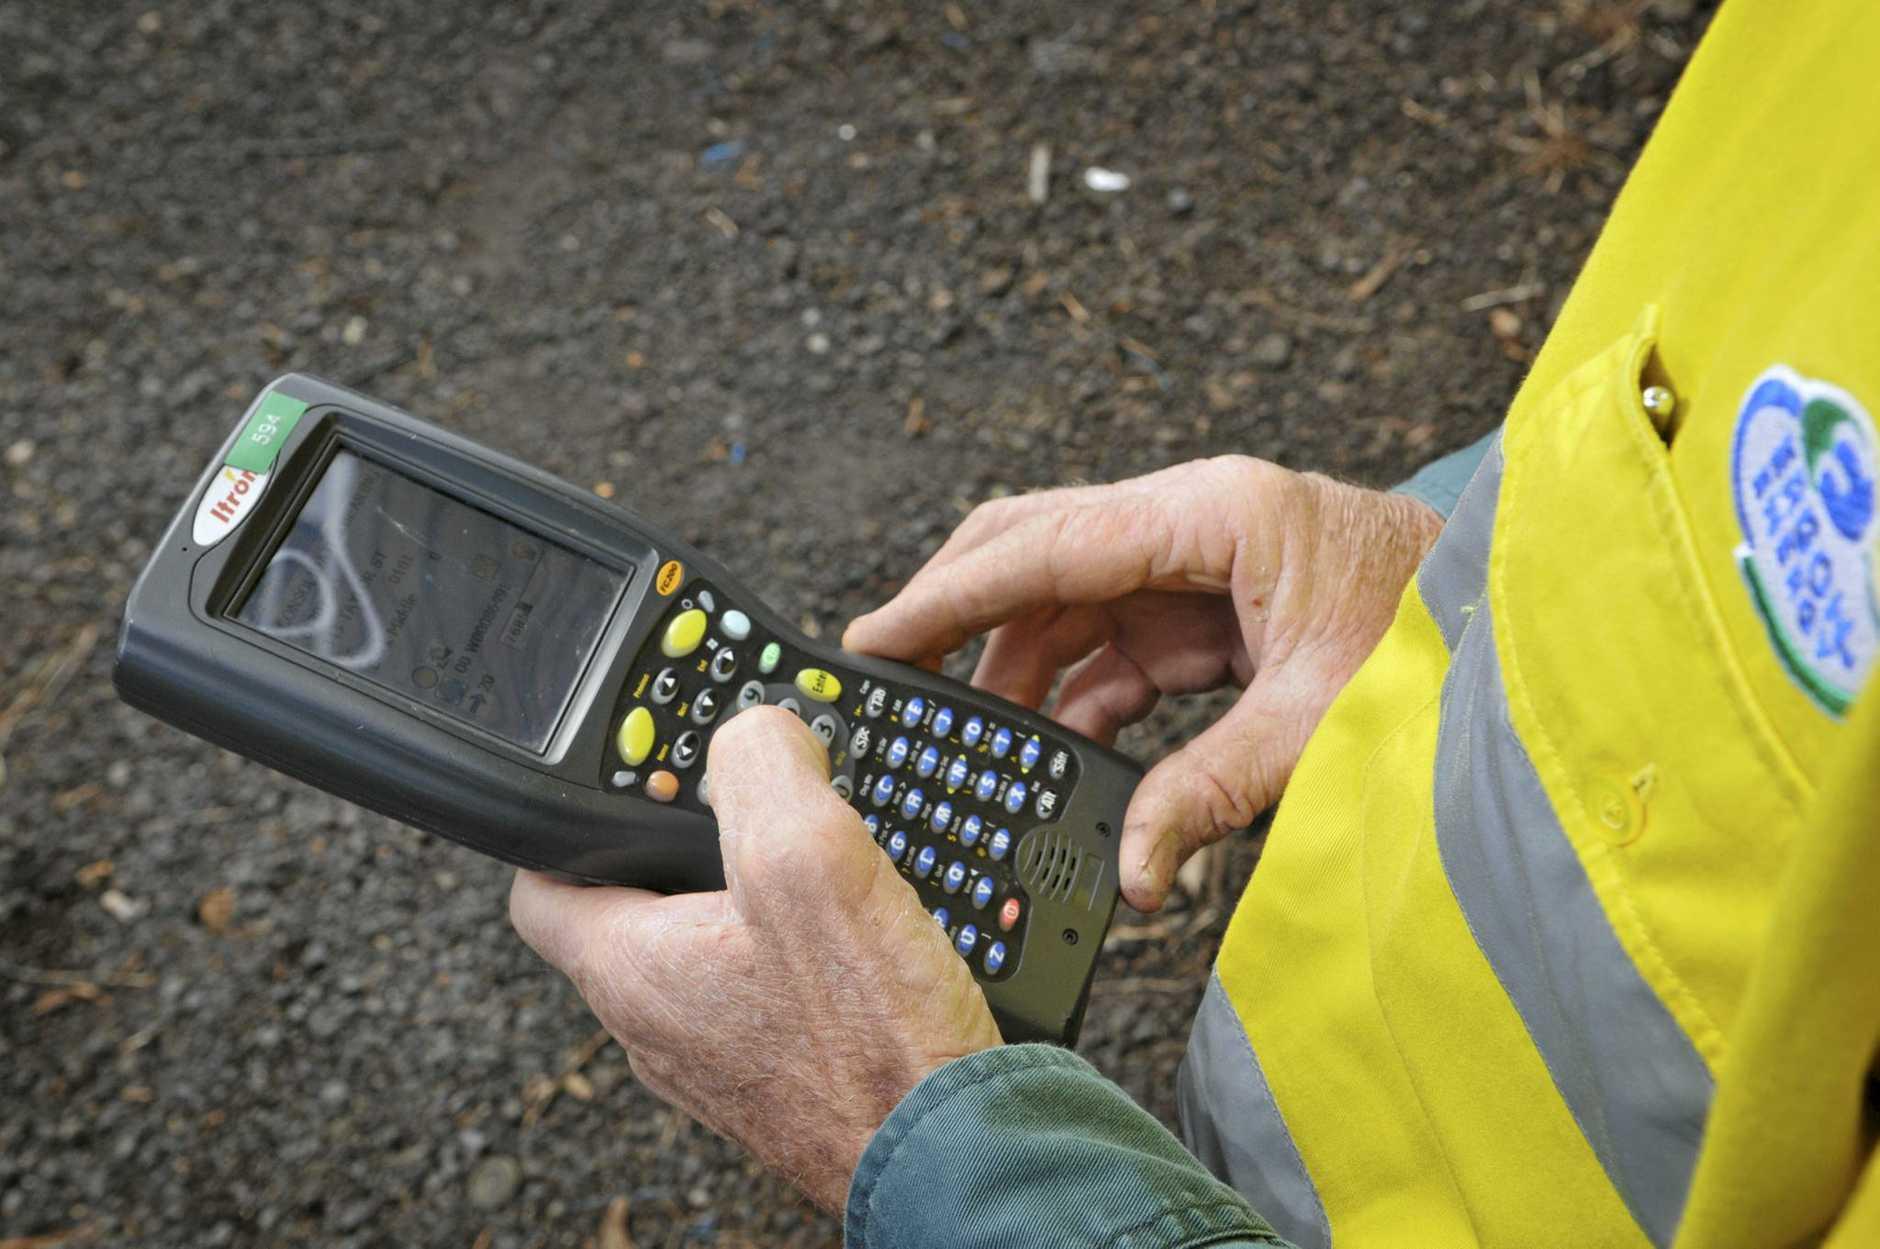 Bogus meter reader on the loose.